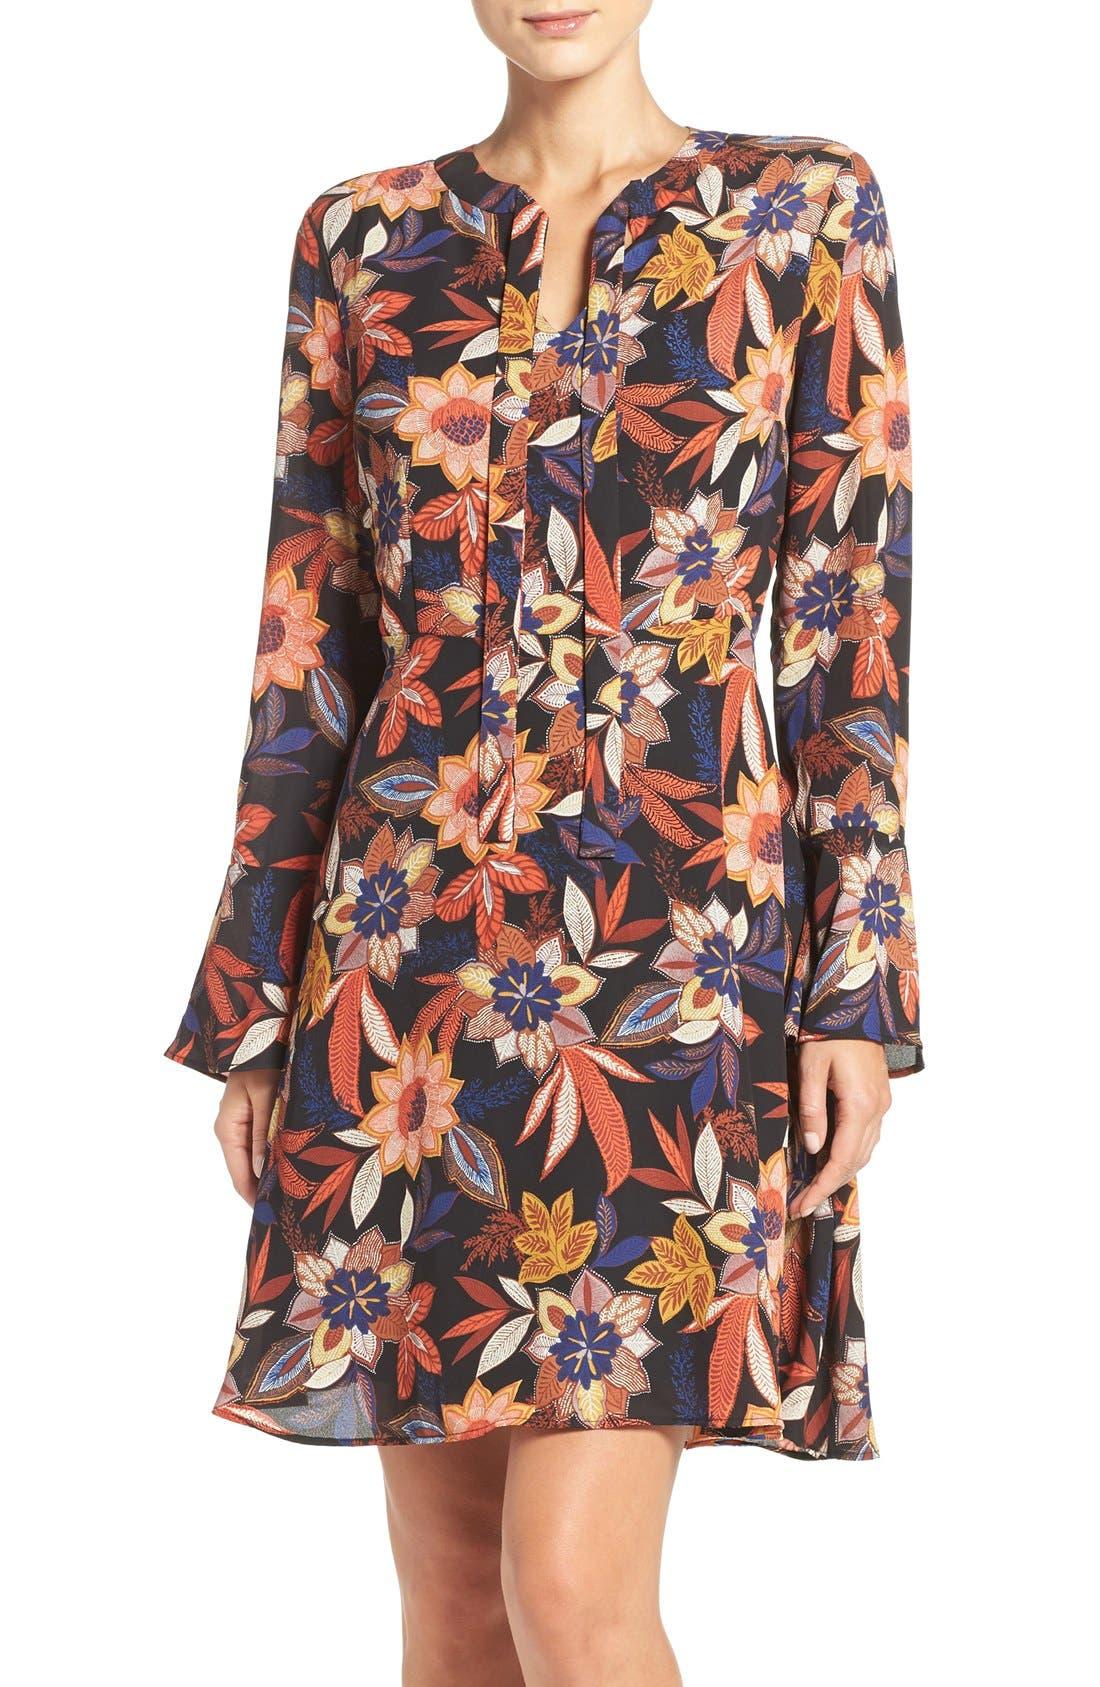 Alternate Image 1 Selected - ECI Floral Print Tie Neck Shift Dress